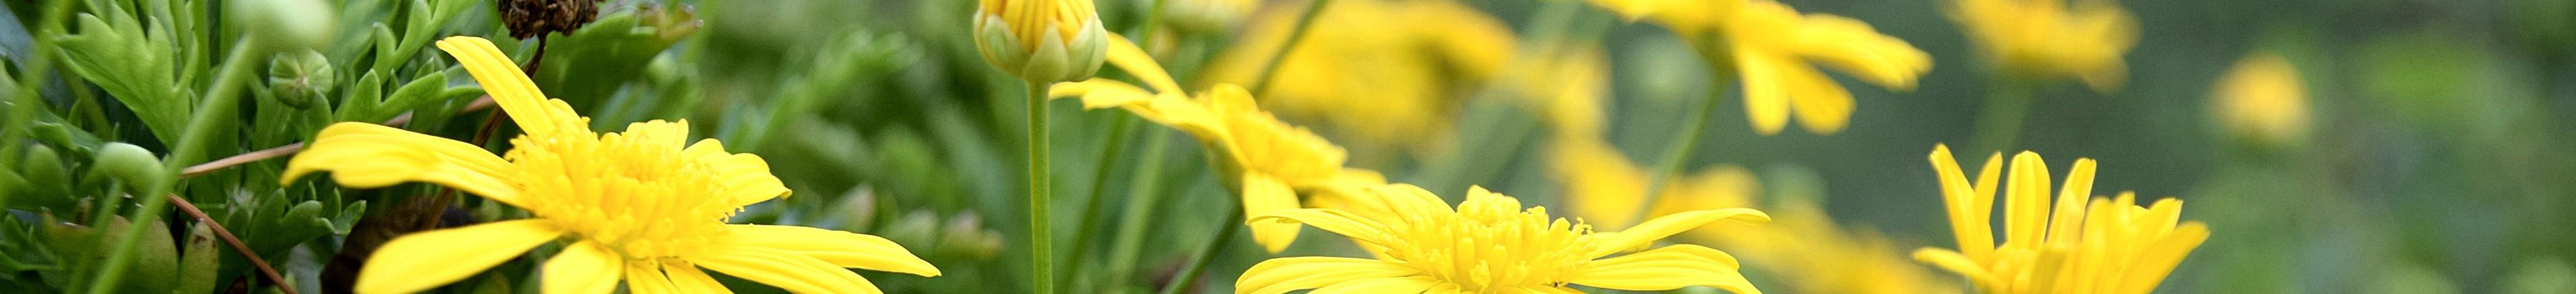 6_fleurs